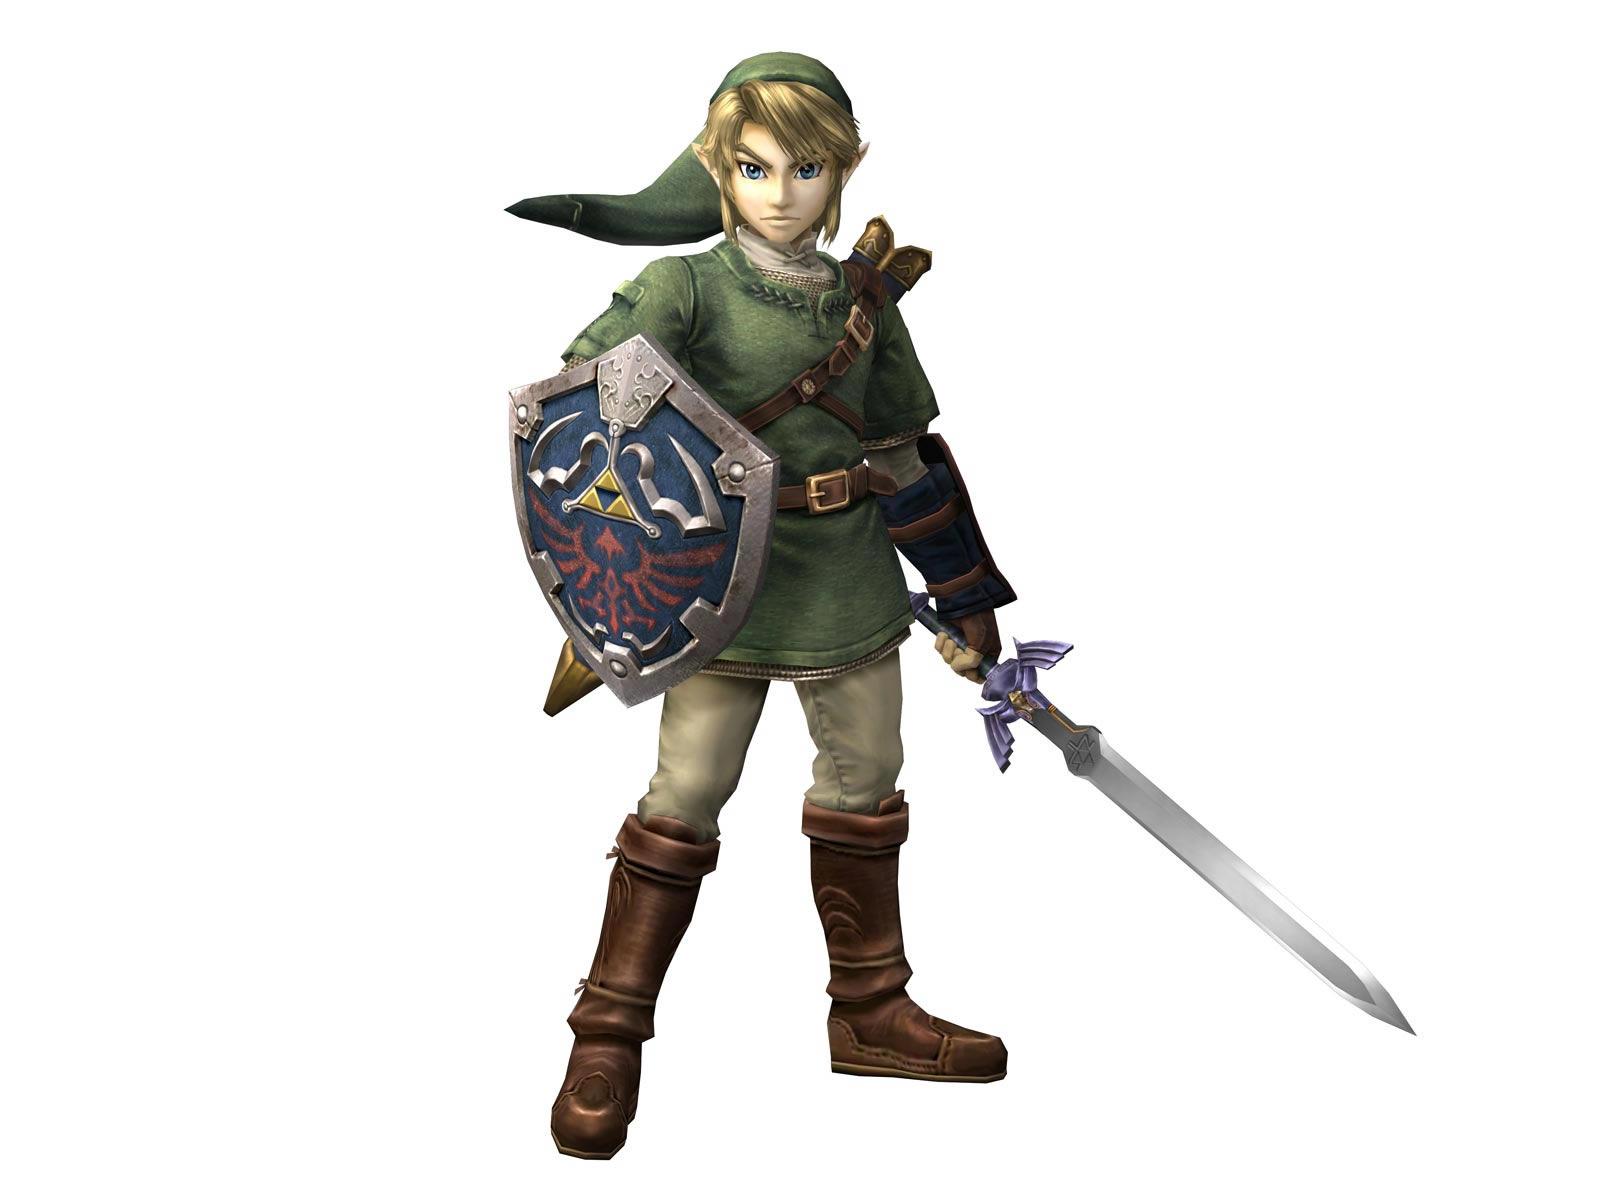 Legend of Zelda Twilight Princess Link